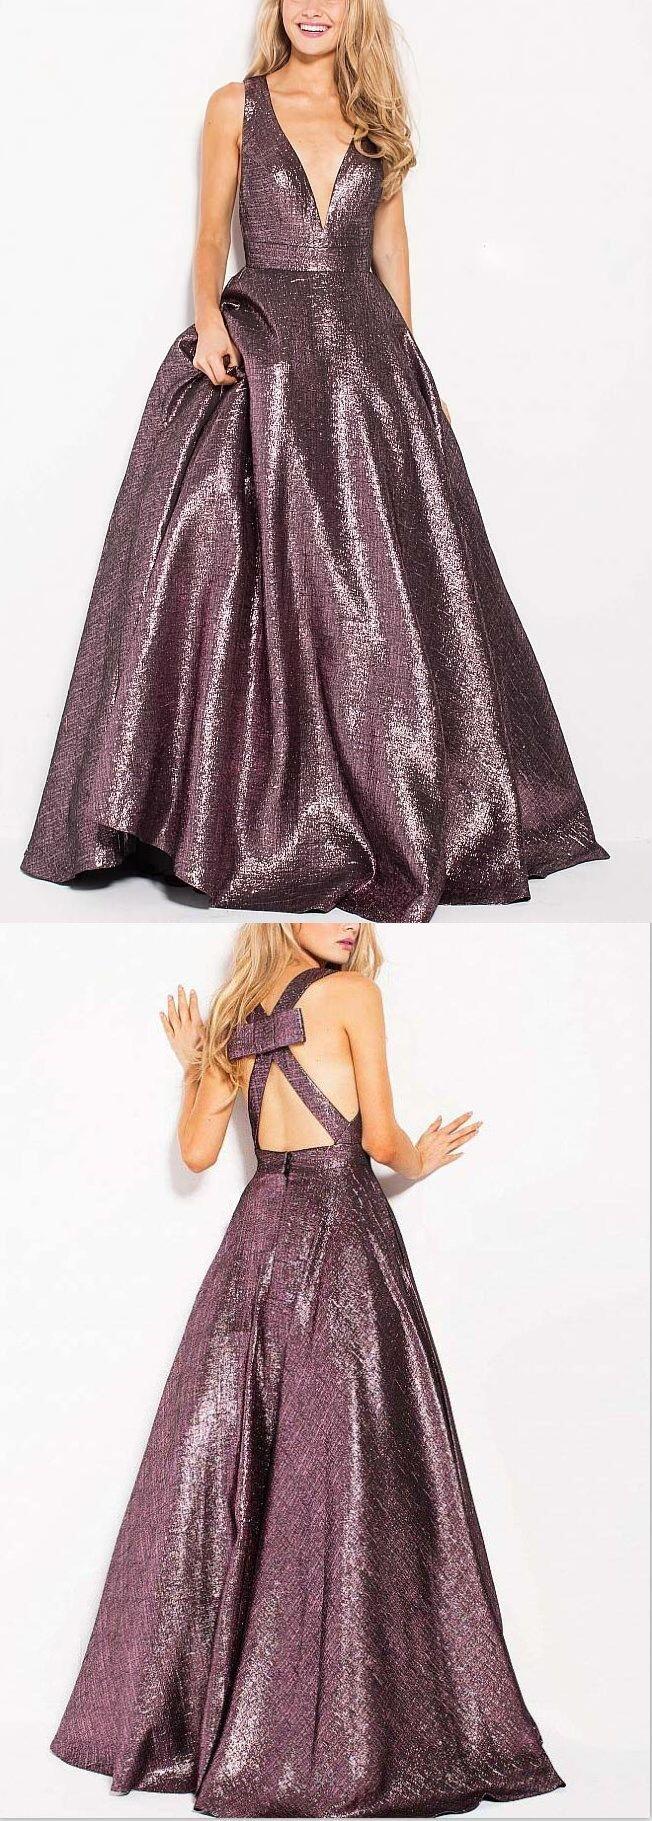 Deep V Neck Sexy Long Sparkly Unique Design Prom Dresses, Evening Dress, Fashion gown, PD0480